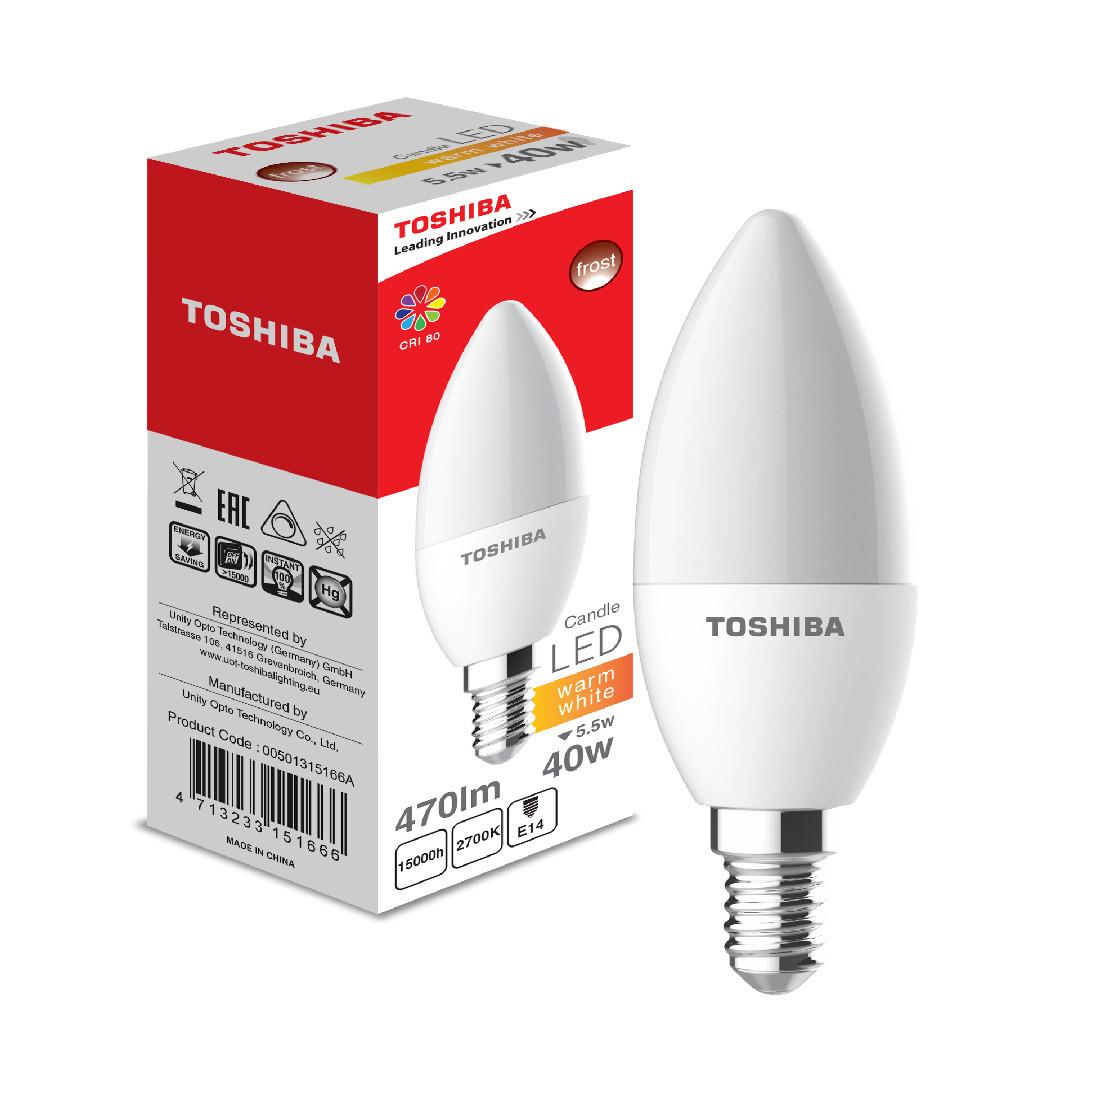 Светодиодная лампа Toshiba 5,5W (40W) 2700K 470lm E14 Dim Тёплый